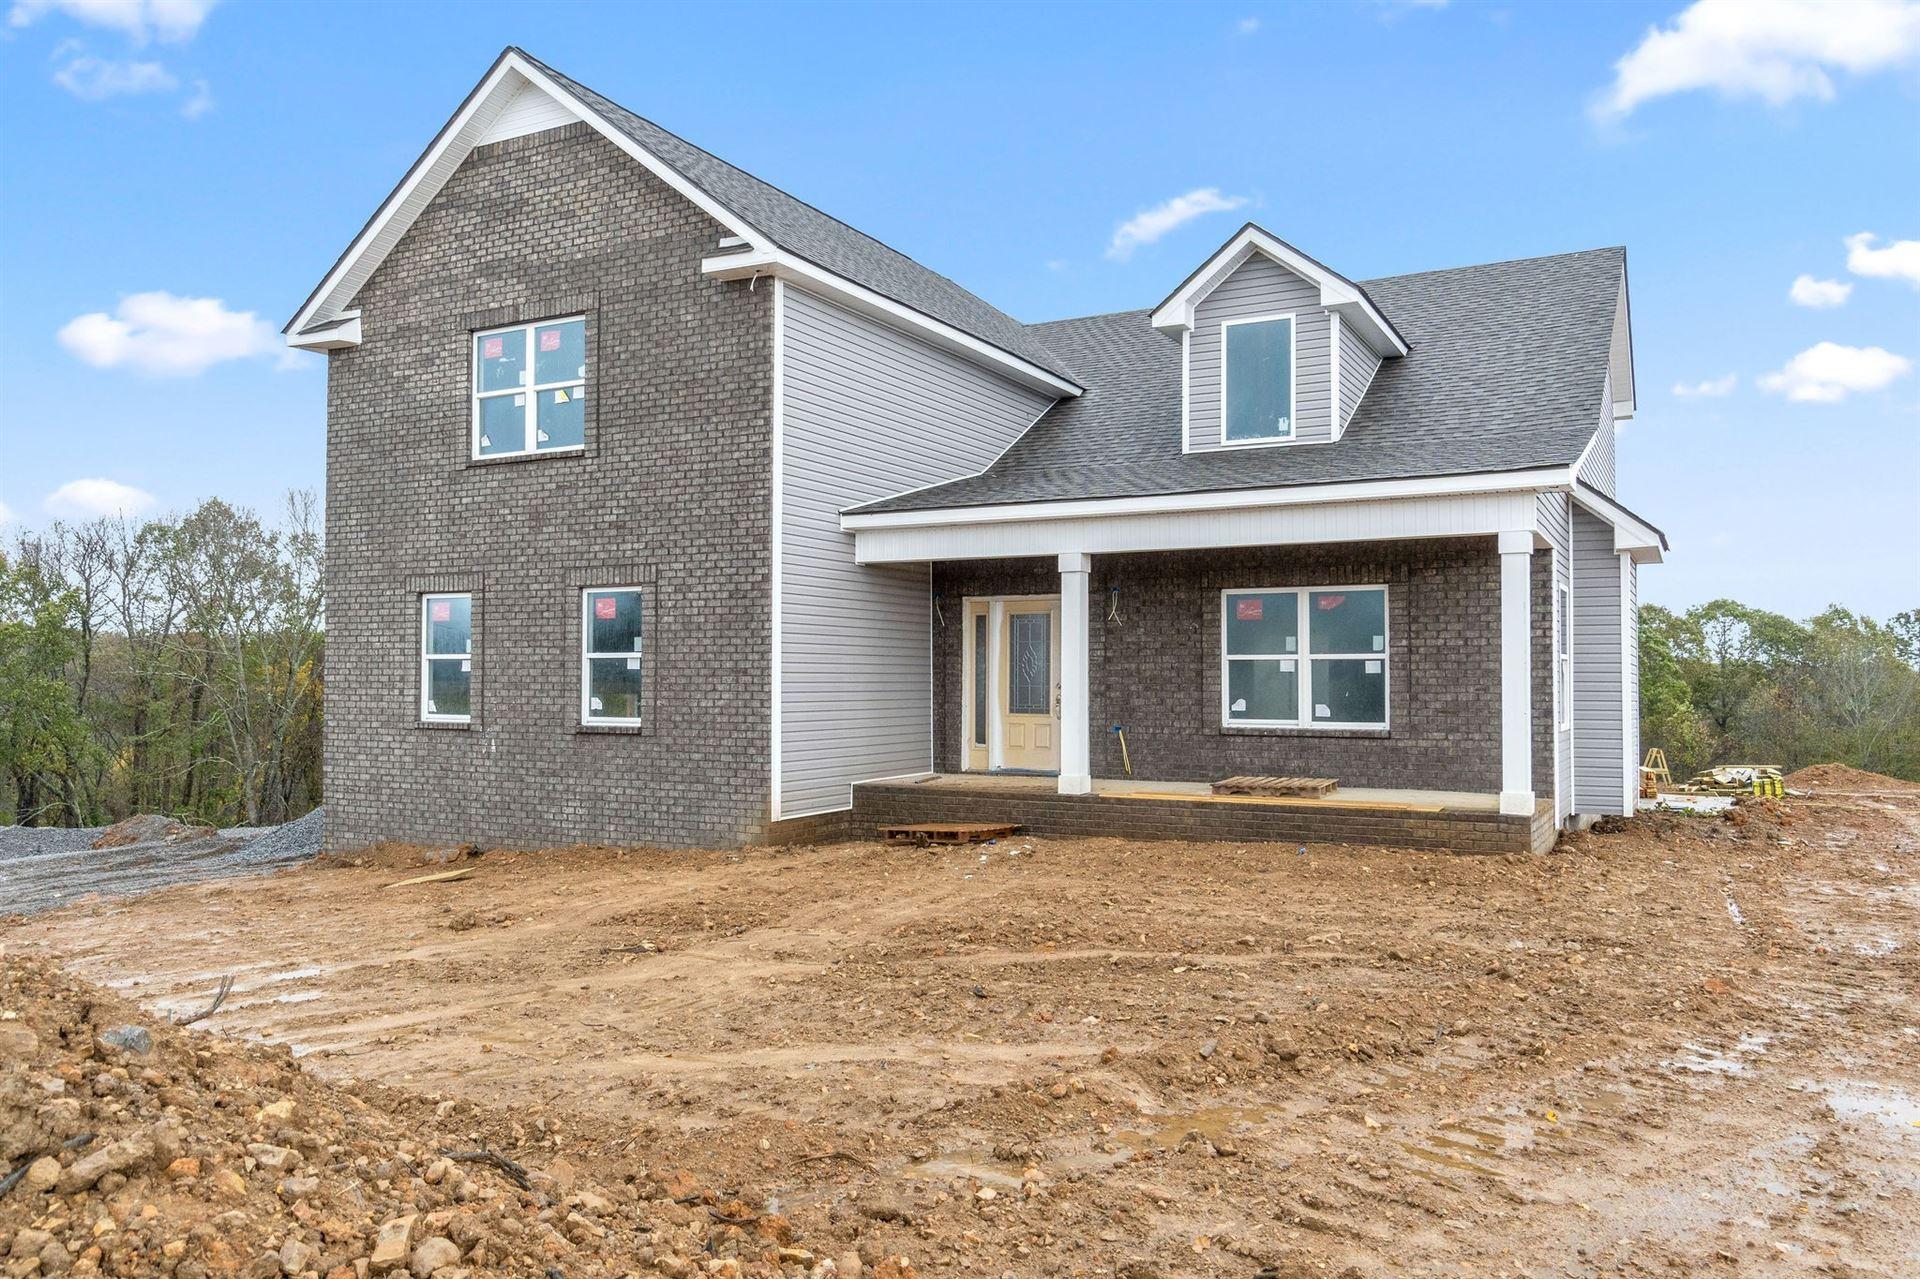 5165 Watkins Ford Rd., Southside, TN 37171 - MLS#: 2206764